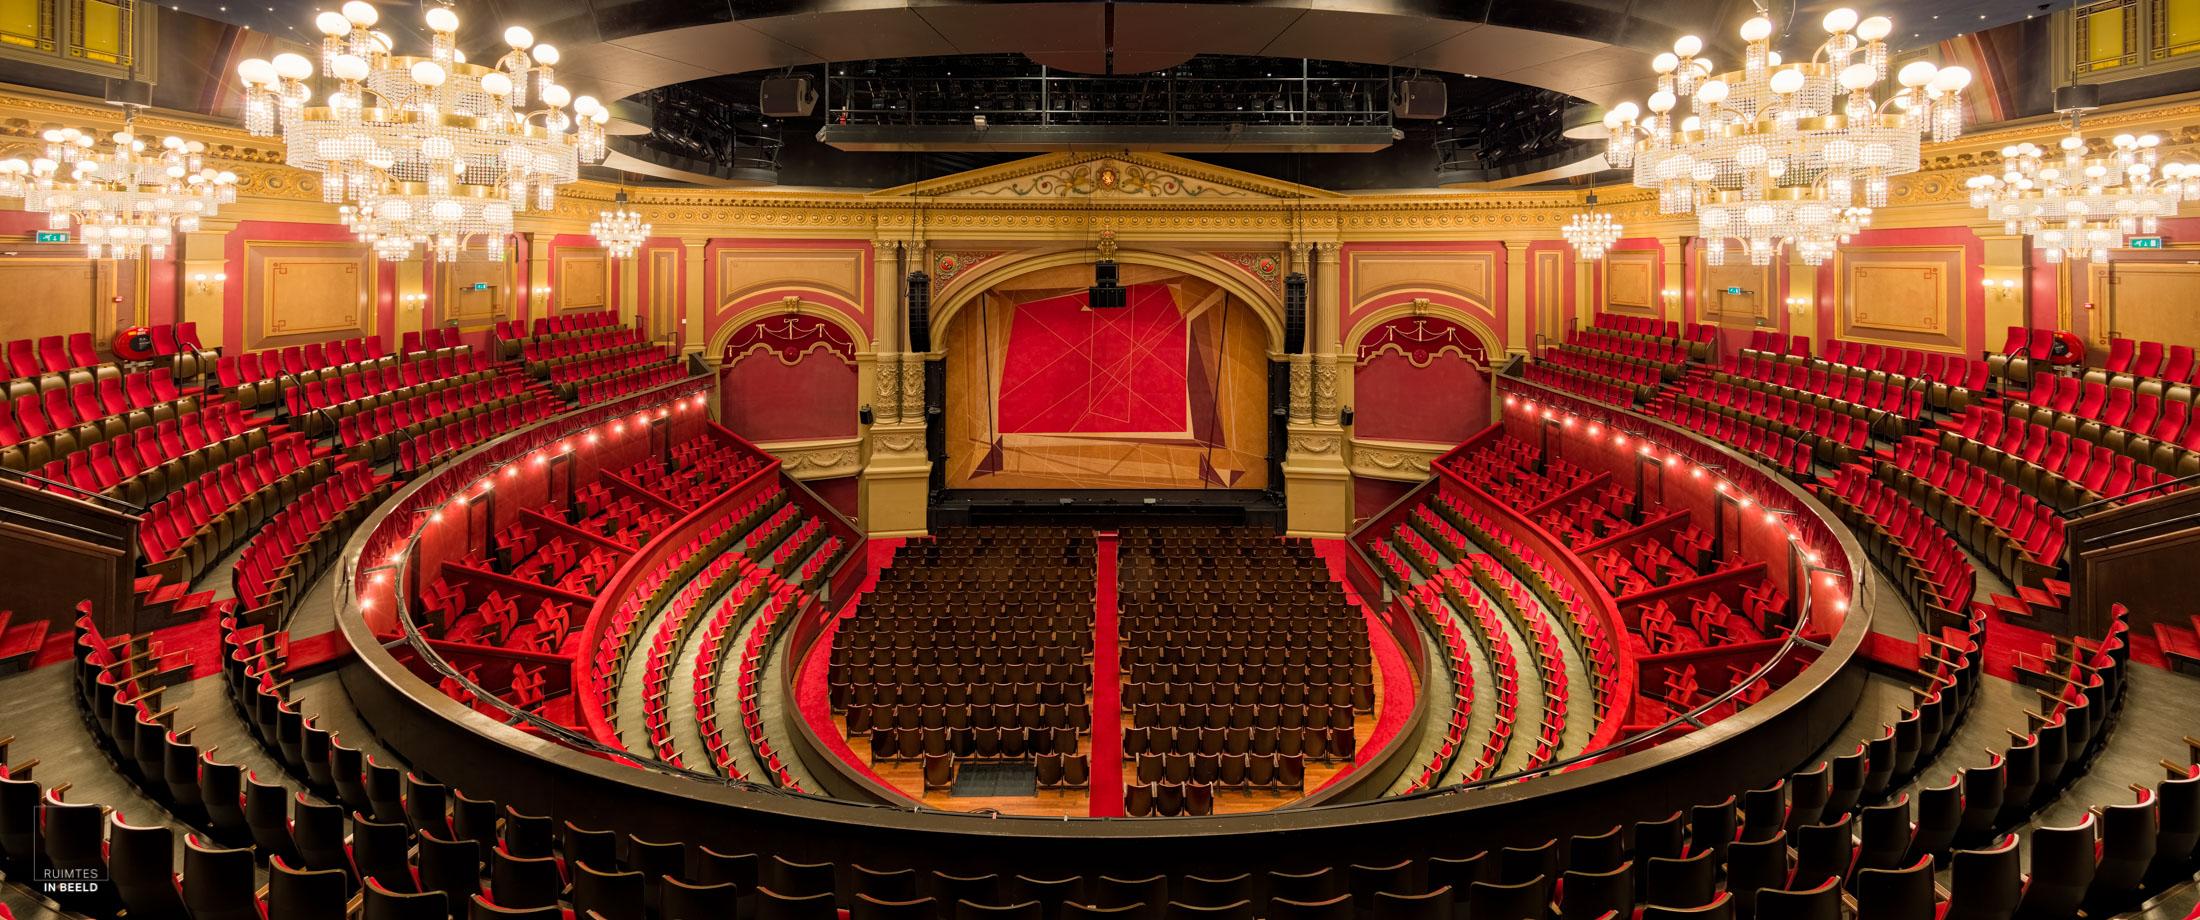 Carre-royal-theater-6.jpg